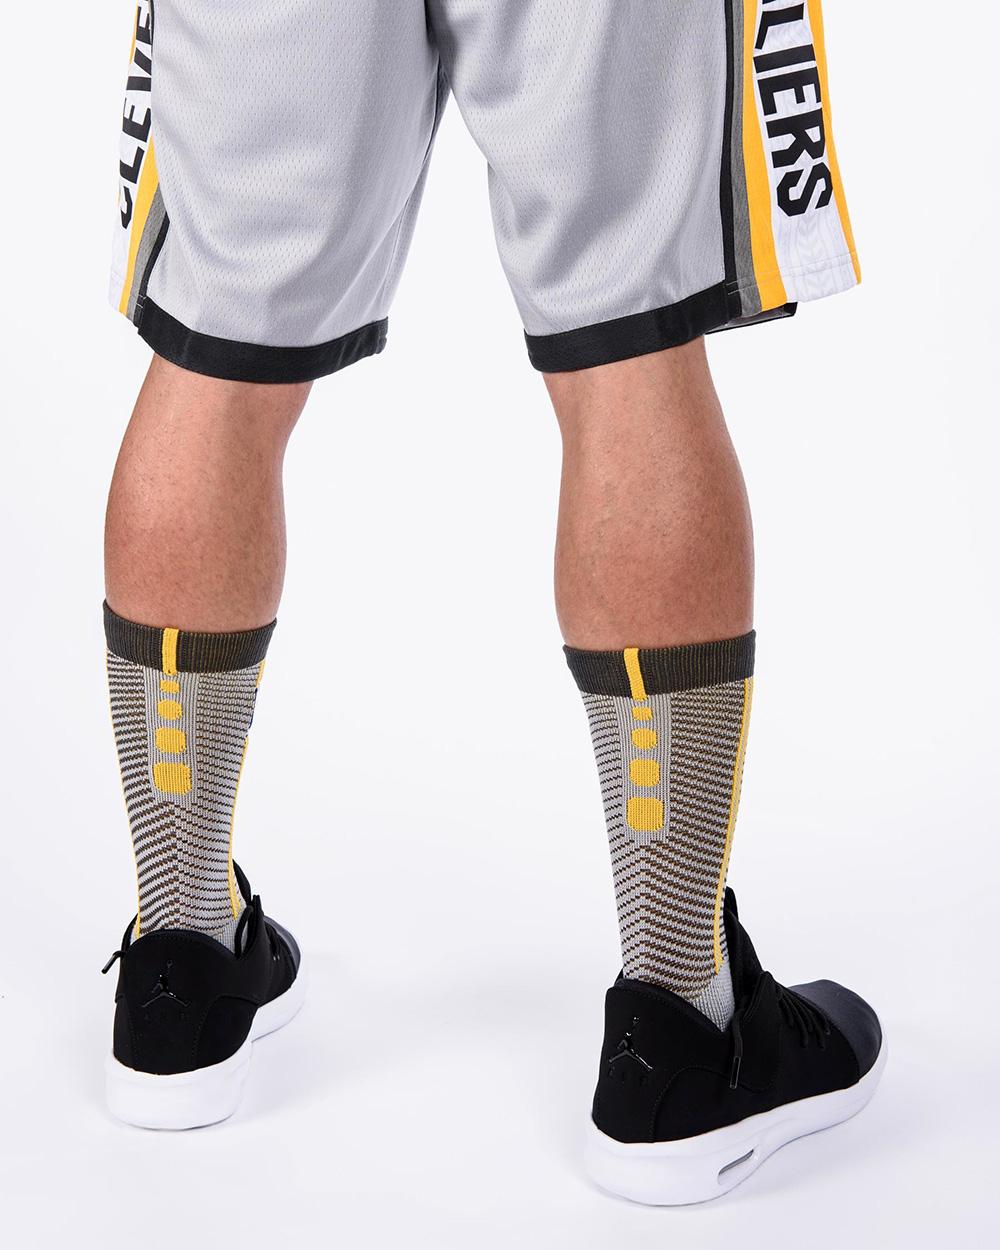 e17d38c3f34 Nike NBA Cleveland Cavaliers City Edition Swingman Shorts - NBA Shop ...